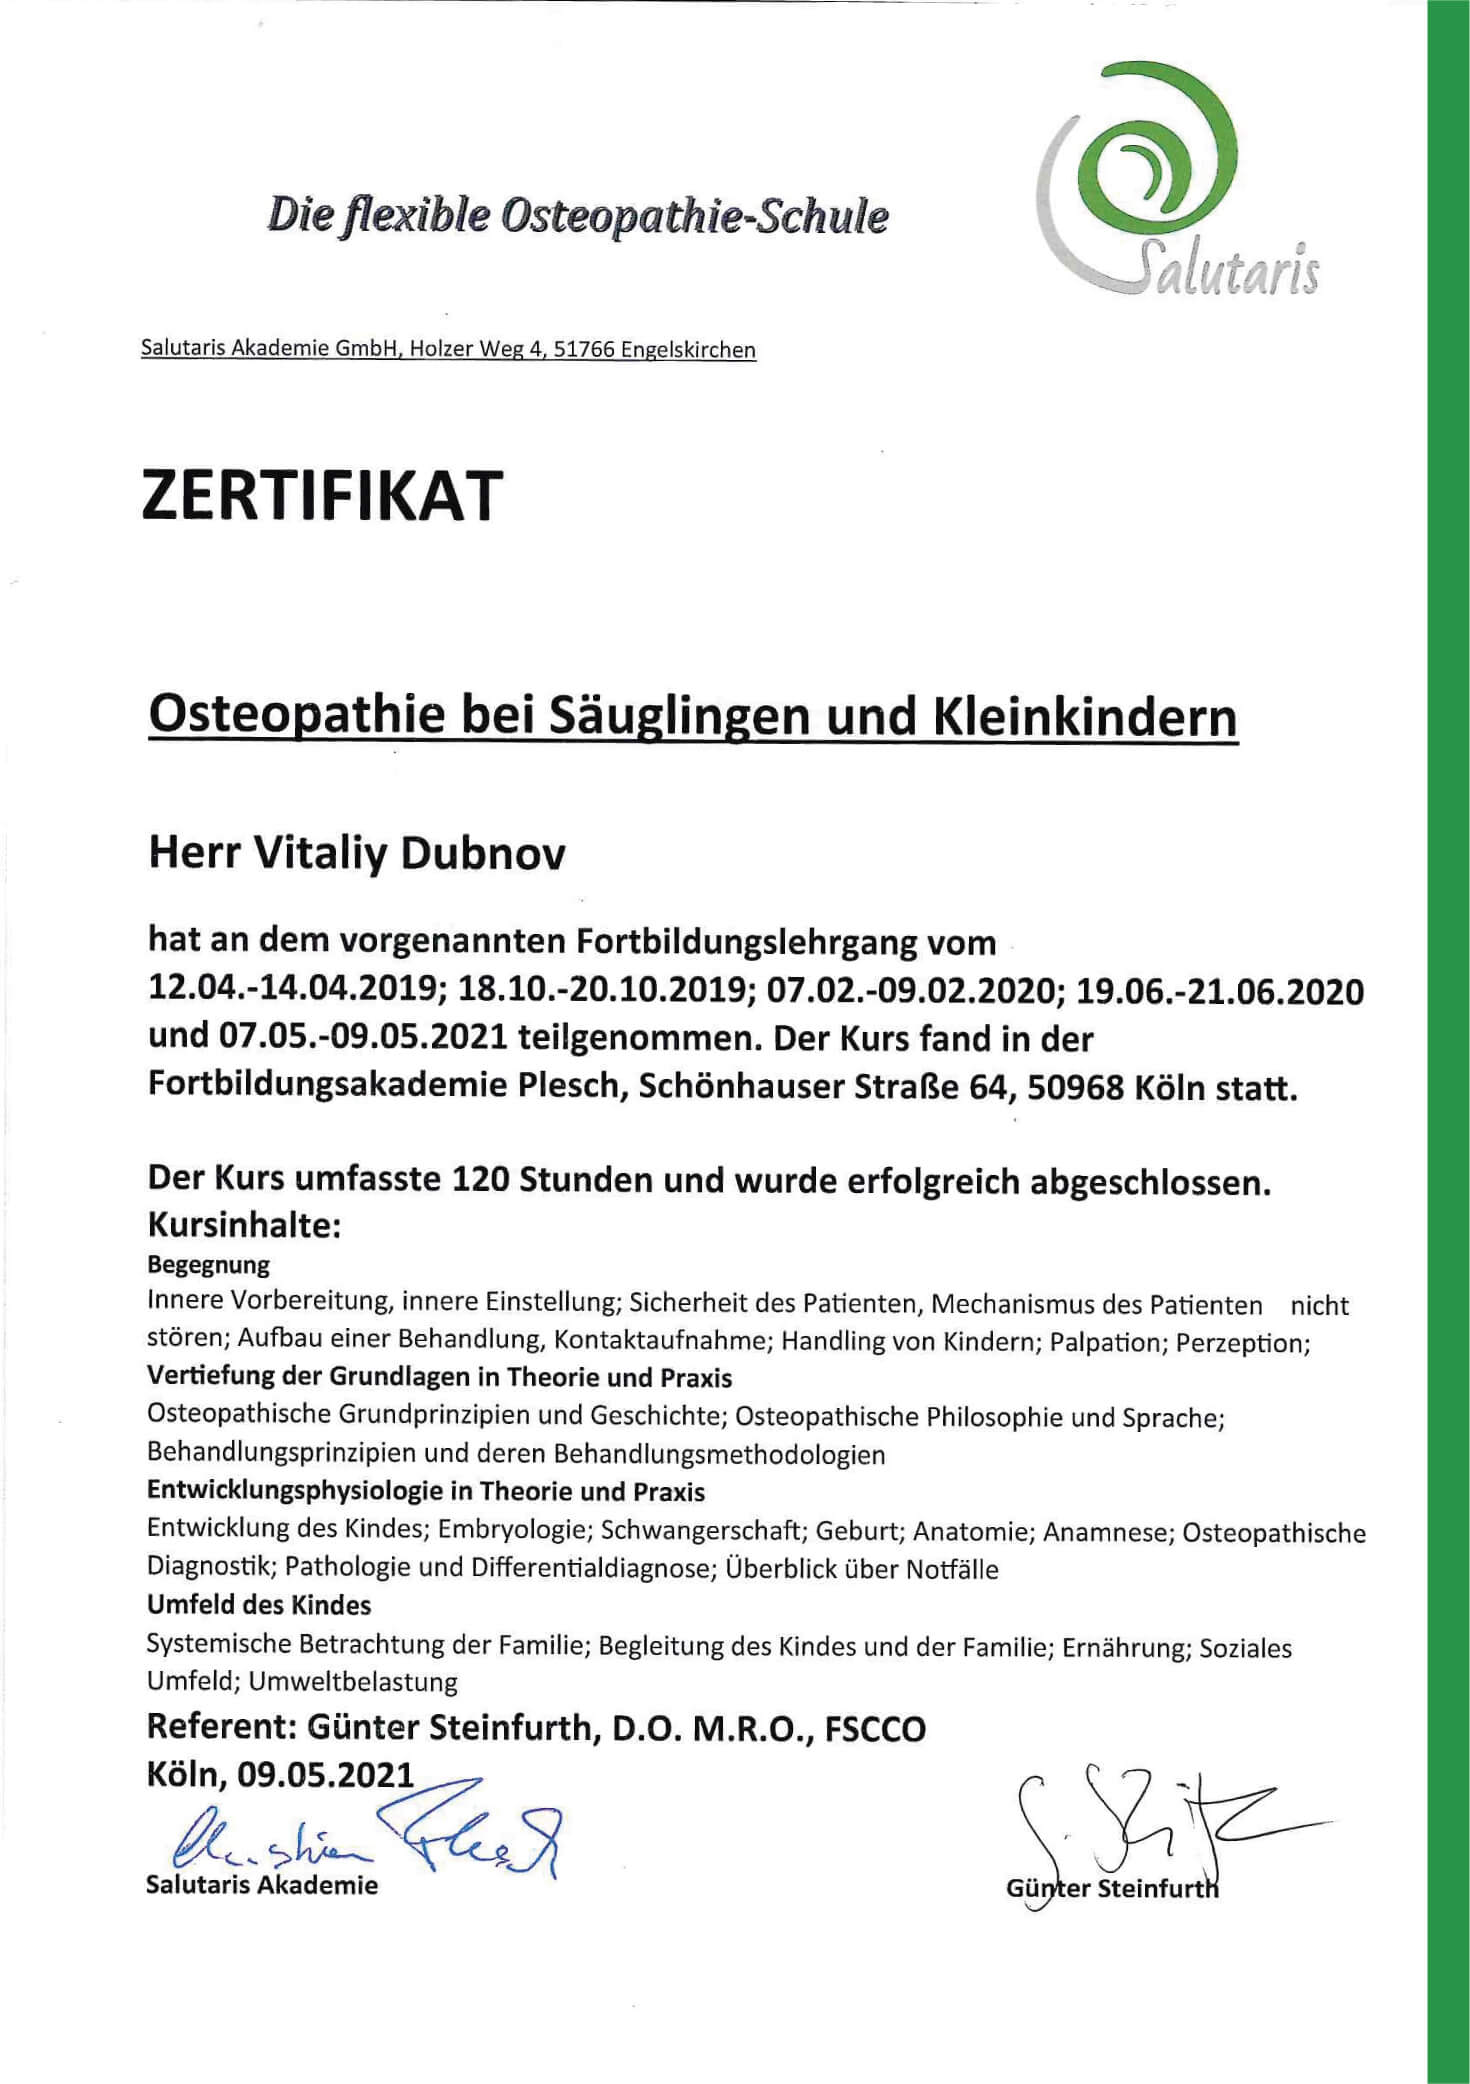 zetifikat_kinderostheopatie_2